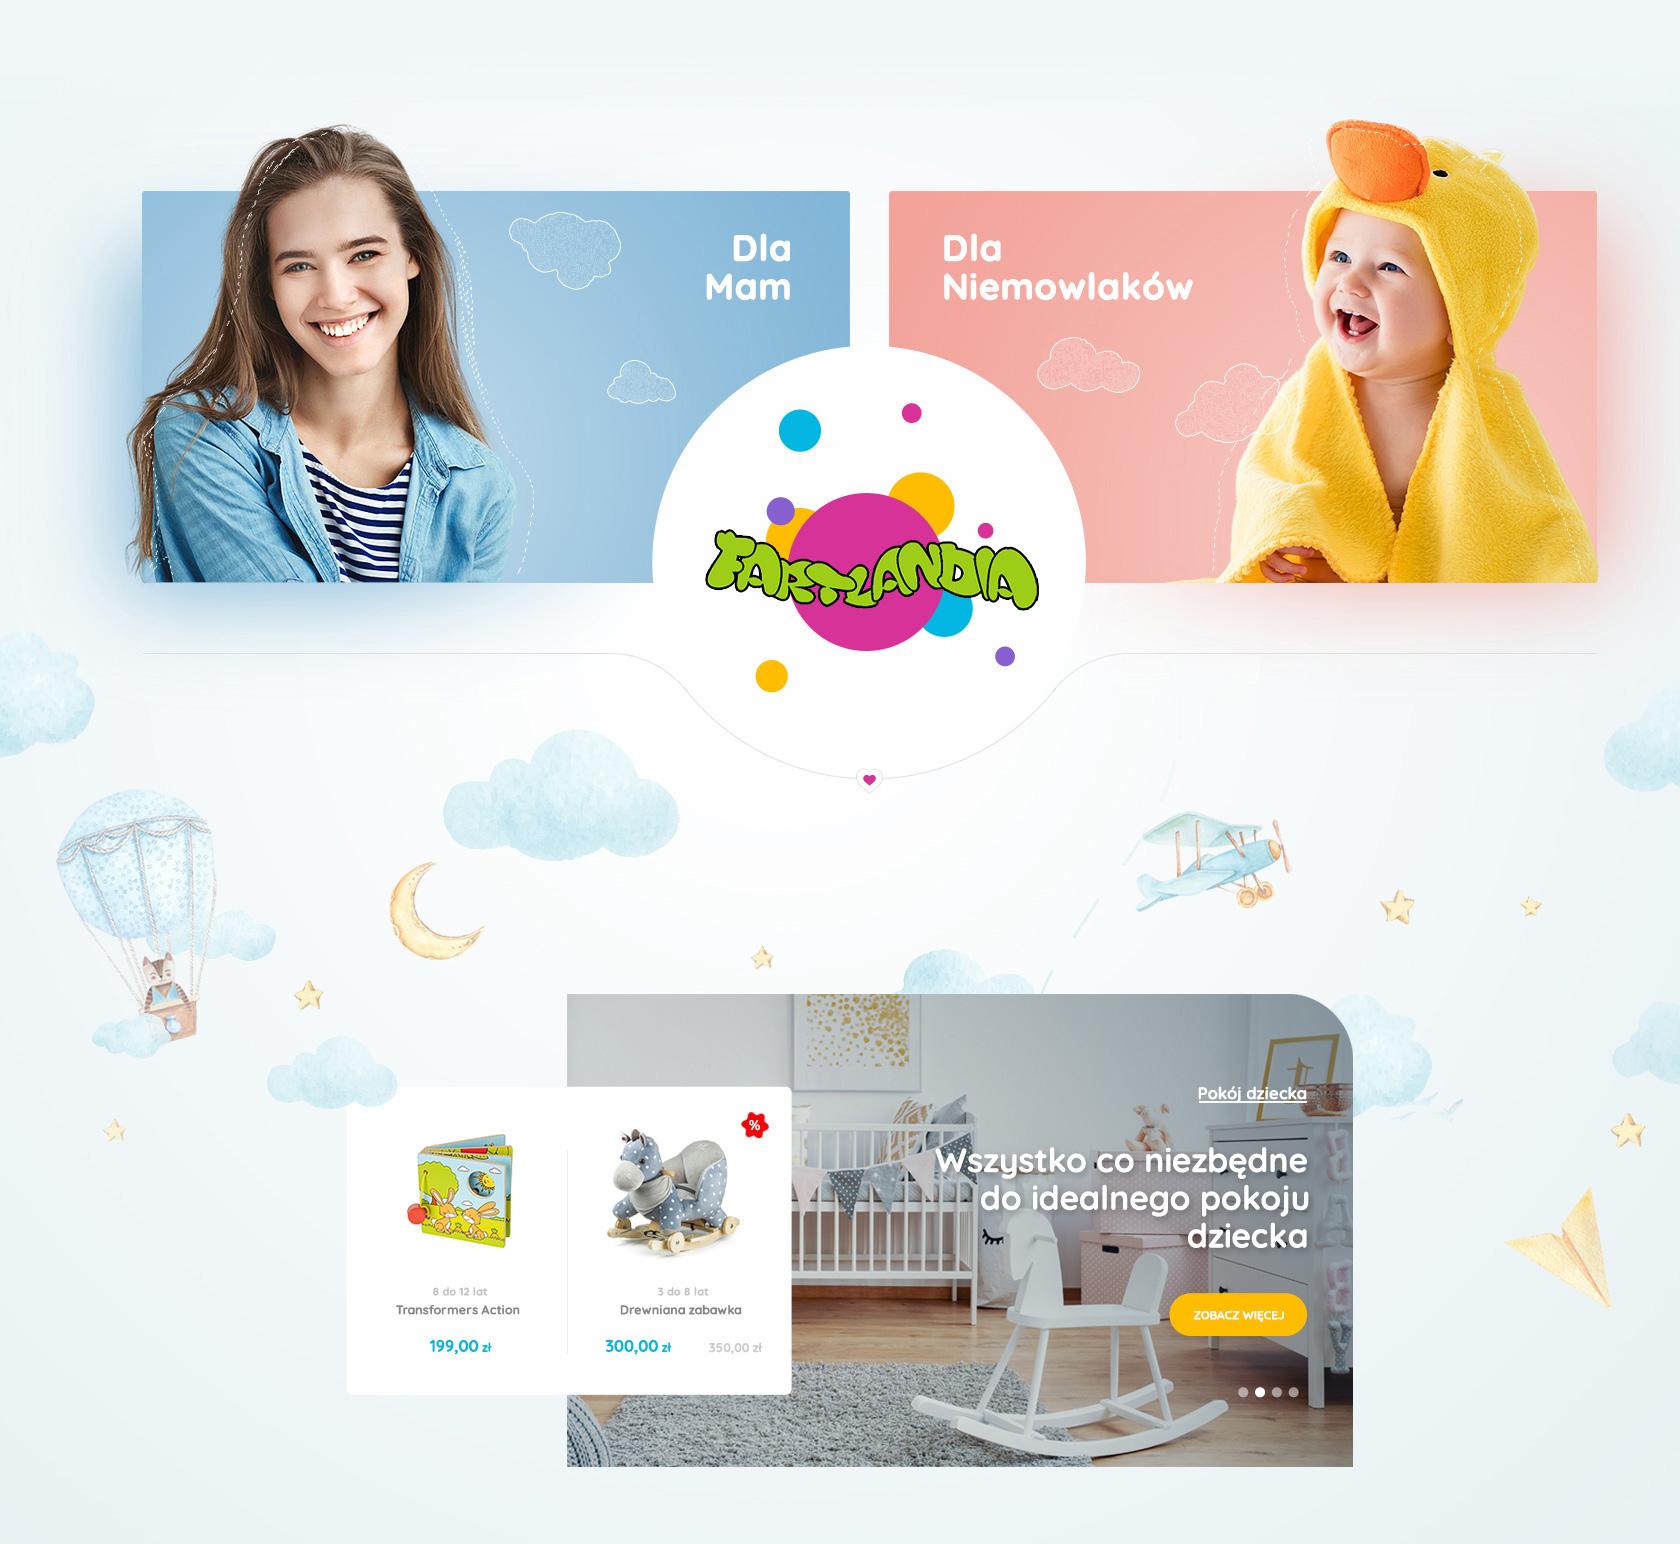 Eilles Website Design